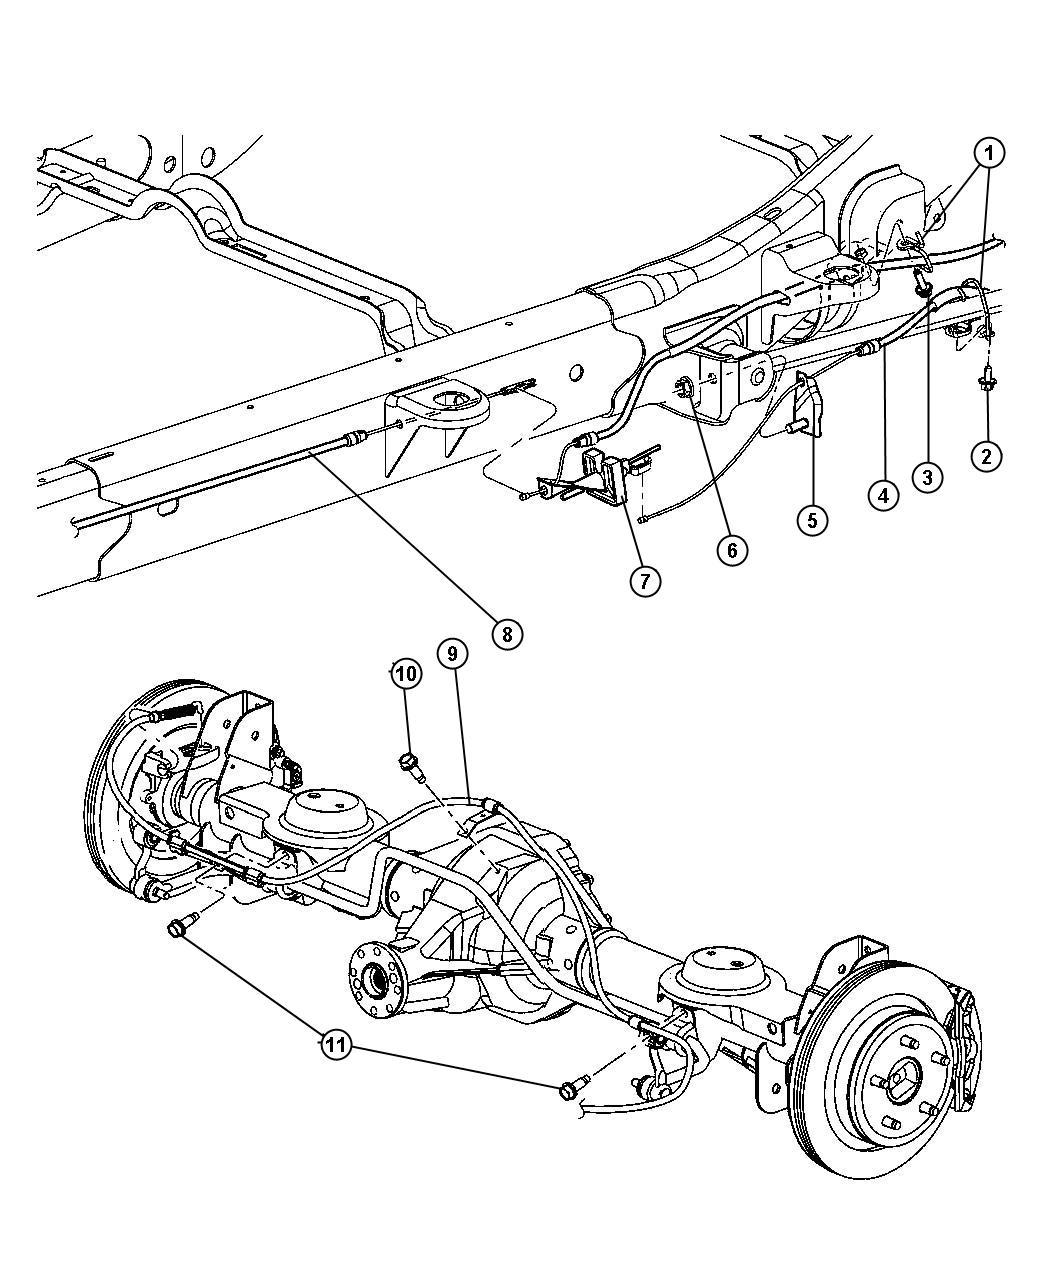 Dodge Durango Cable Parking Brake Front Lever Cables